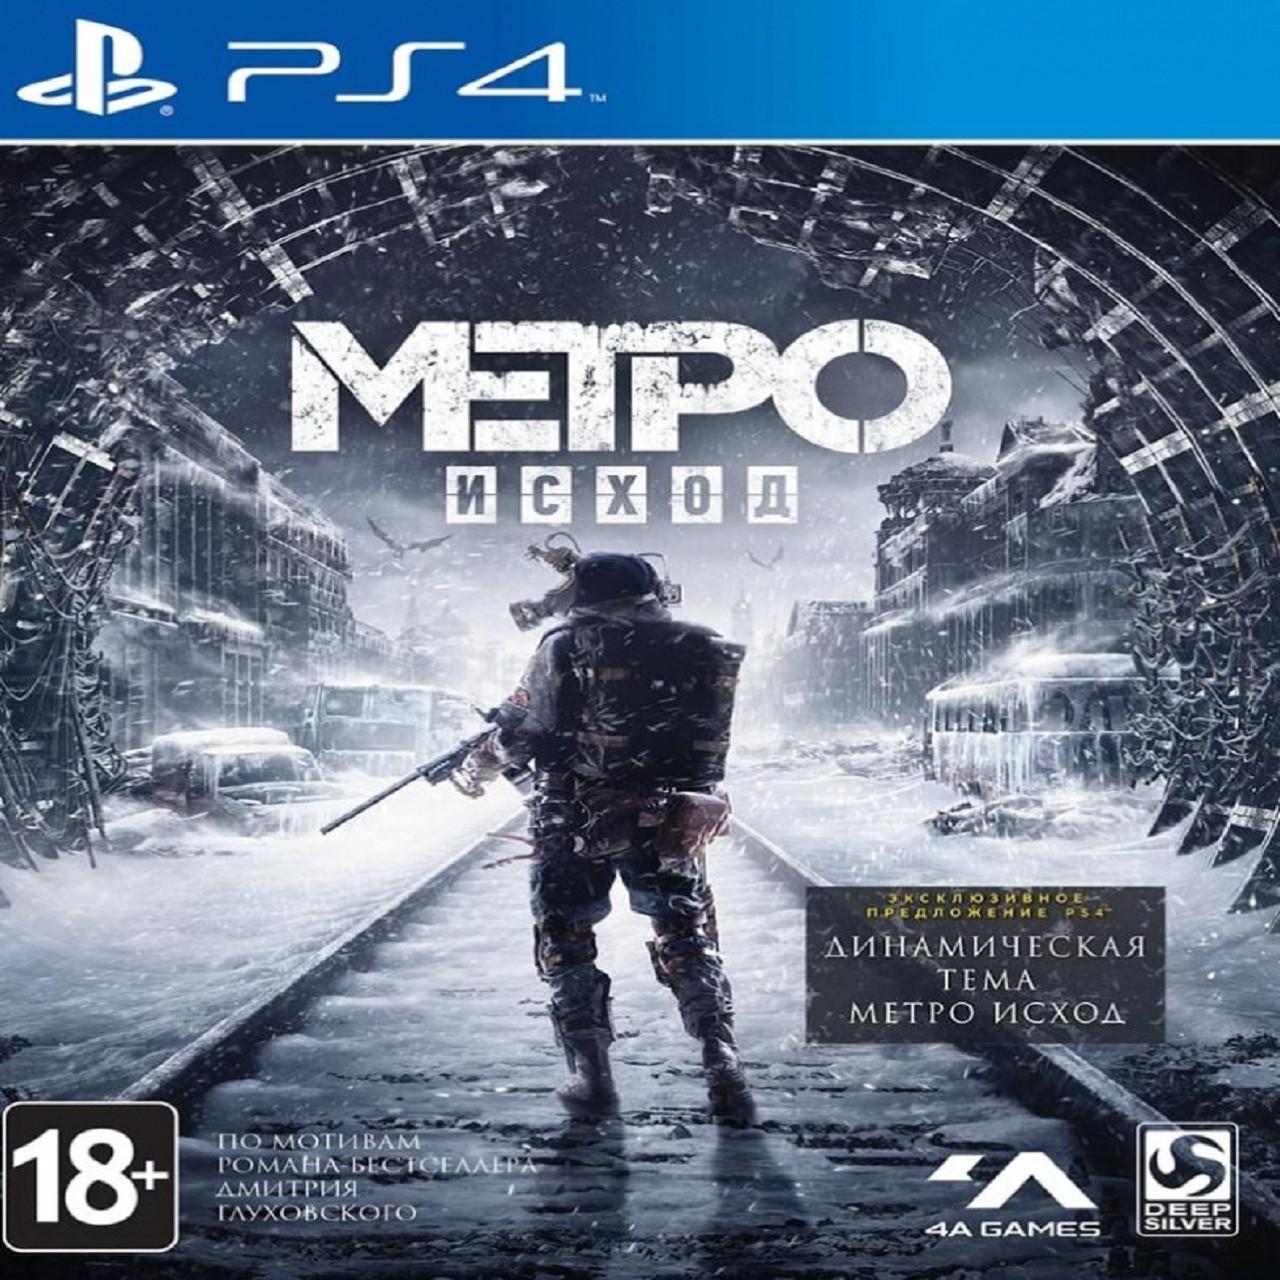 Metro Exodus RUS PS4